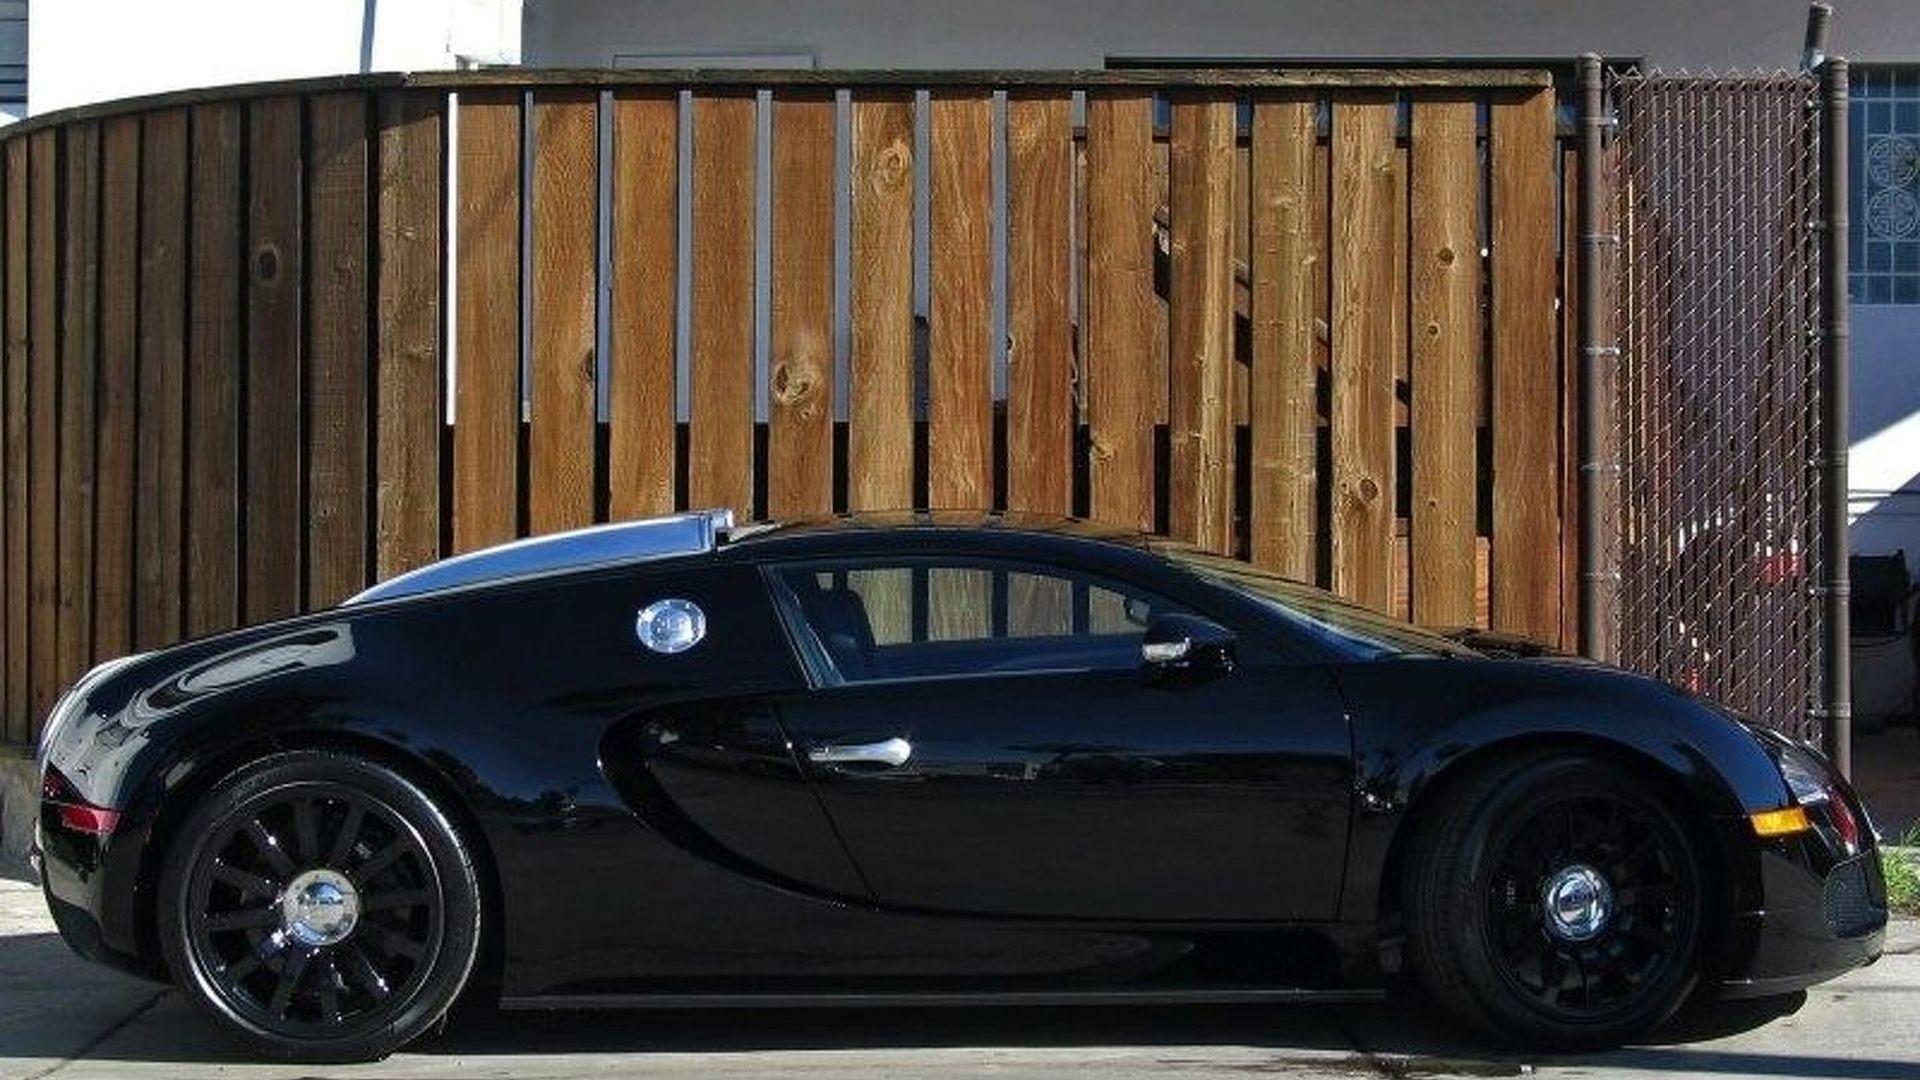 Veyron for sale